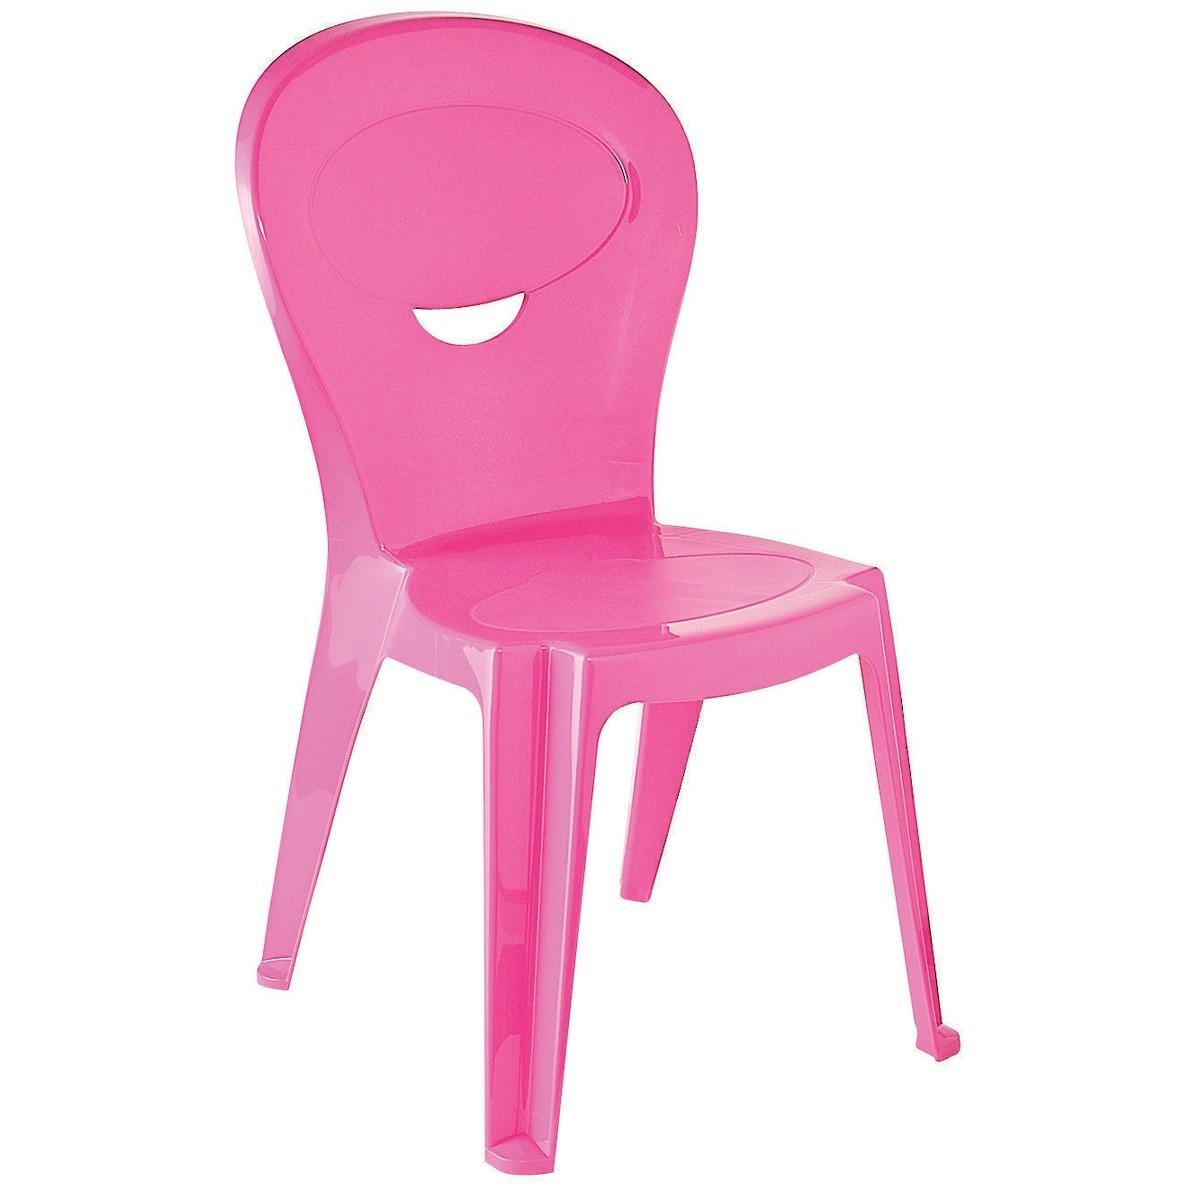 Cadeira Vice Ref. 92270/060 Tramontina Rosa